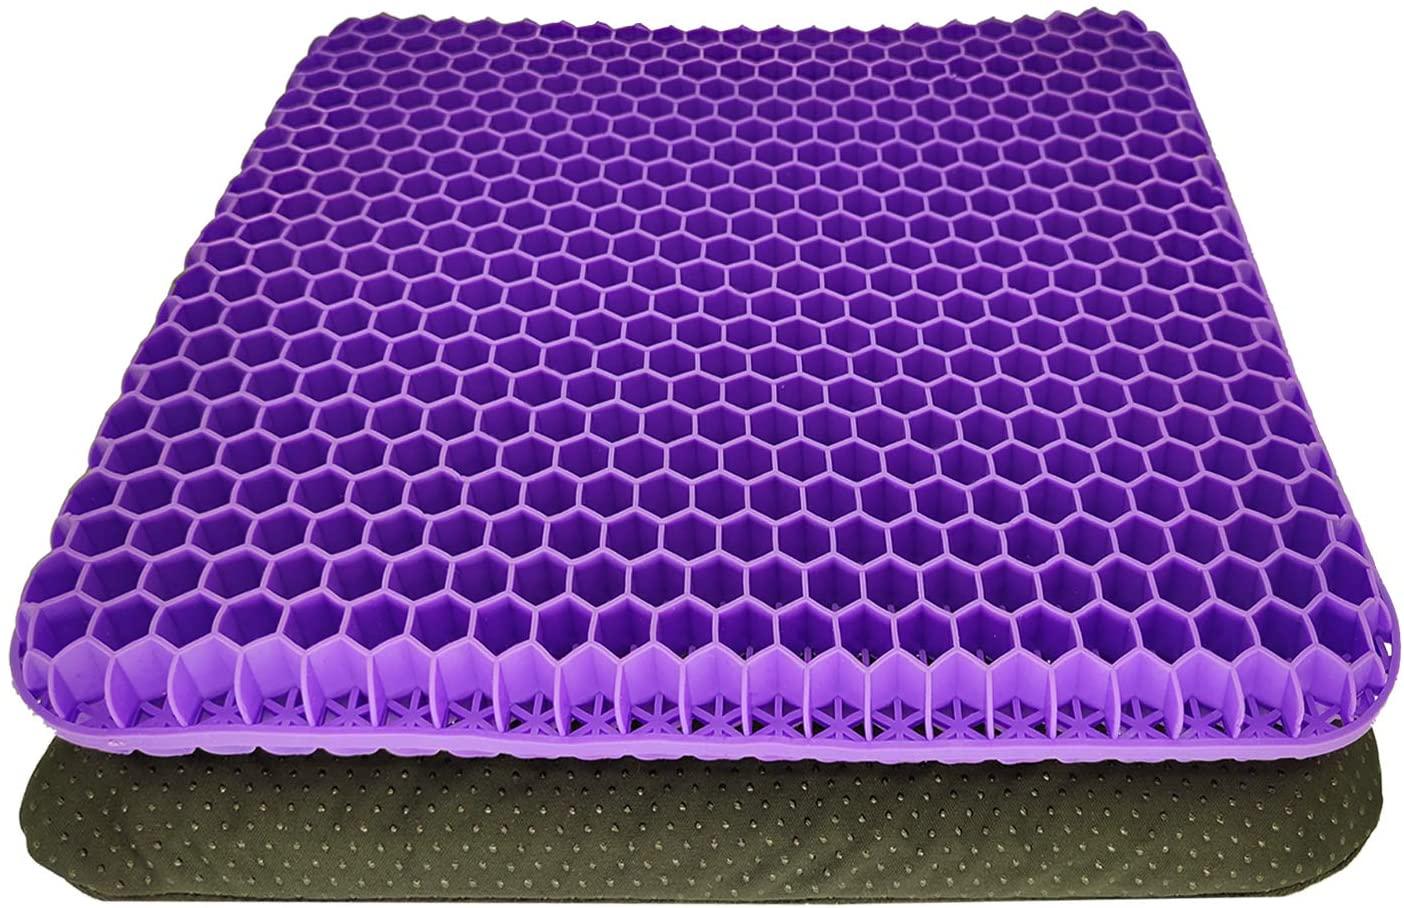 Gel seat Cushion,Enhanced Double-Layer Non-Slip Cushion, Purple seat Cushion, Help in Relieving Back Pain & Sciatica Pain,Seat Cushion for The Car,Office,Wheelchair&Chair.Breathable,Durable,Portable